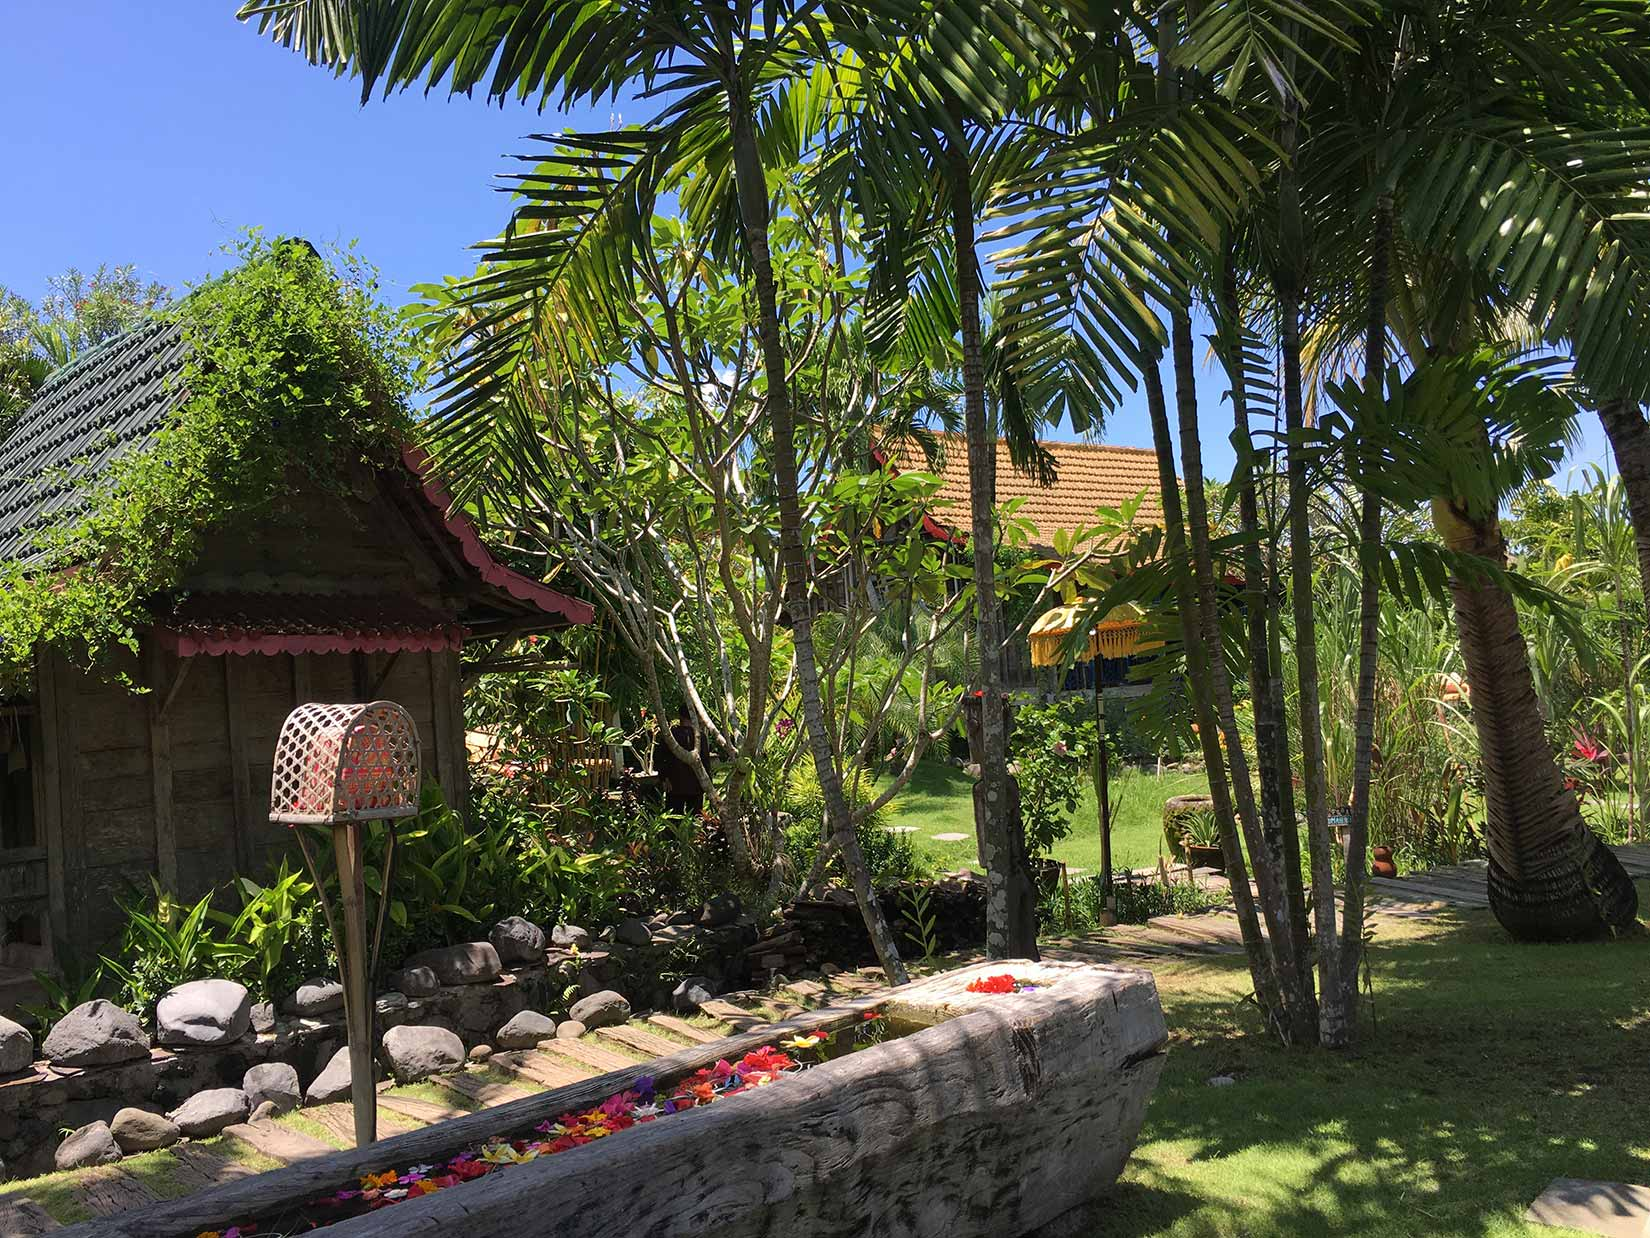 Yoga-Corner-Luxe-Retreat-Bali-2017-Desa-Seni-(Accom).jpg